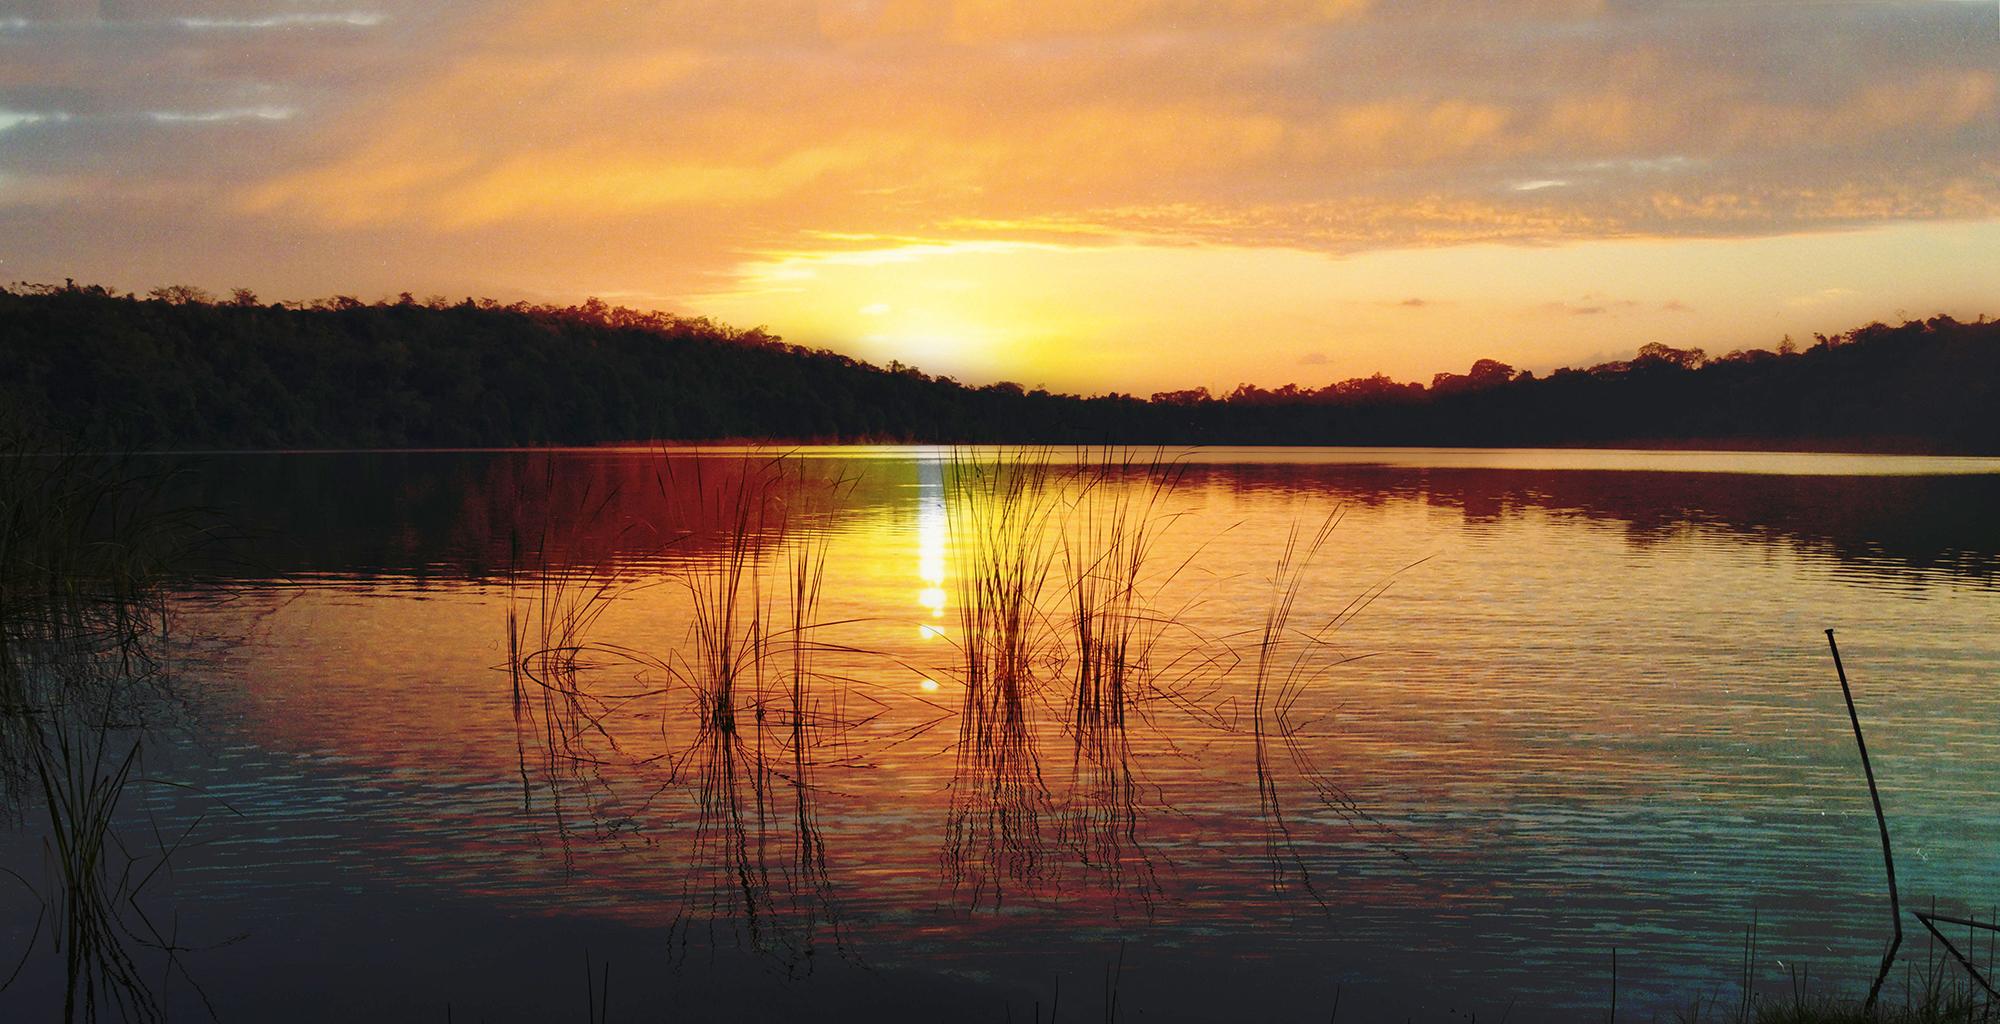 Tanzania-Arusha-Sunset